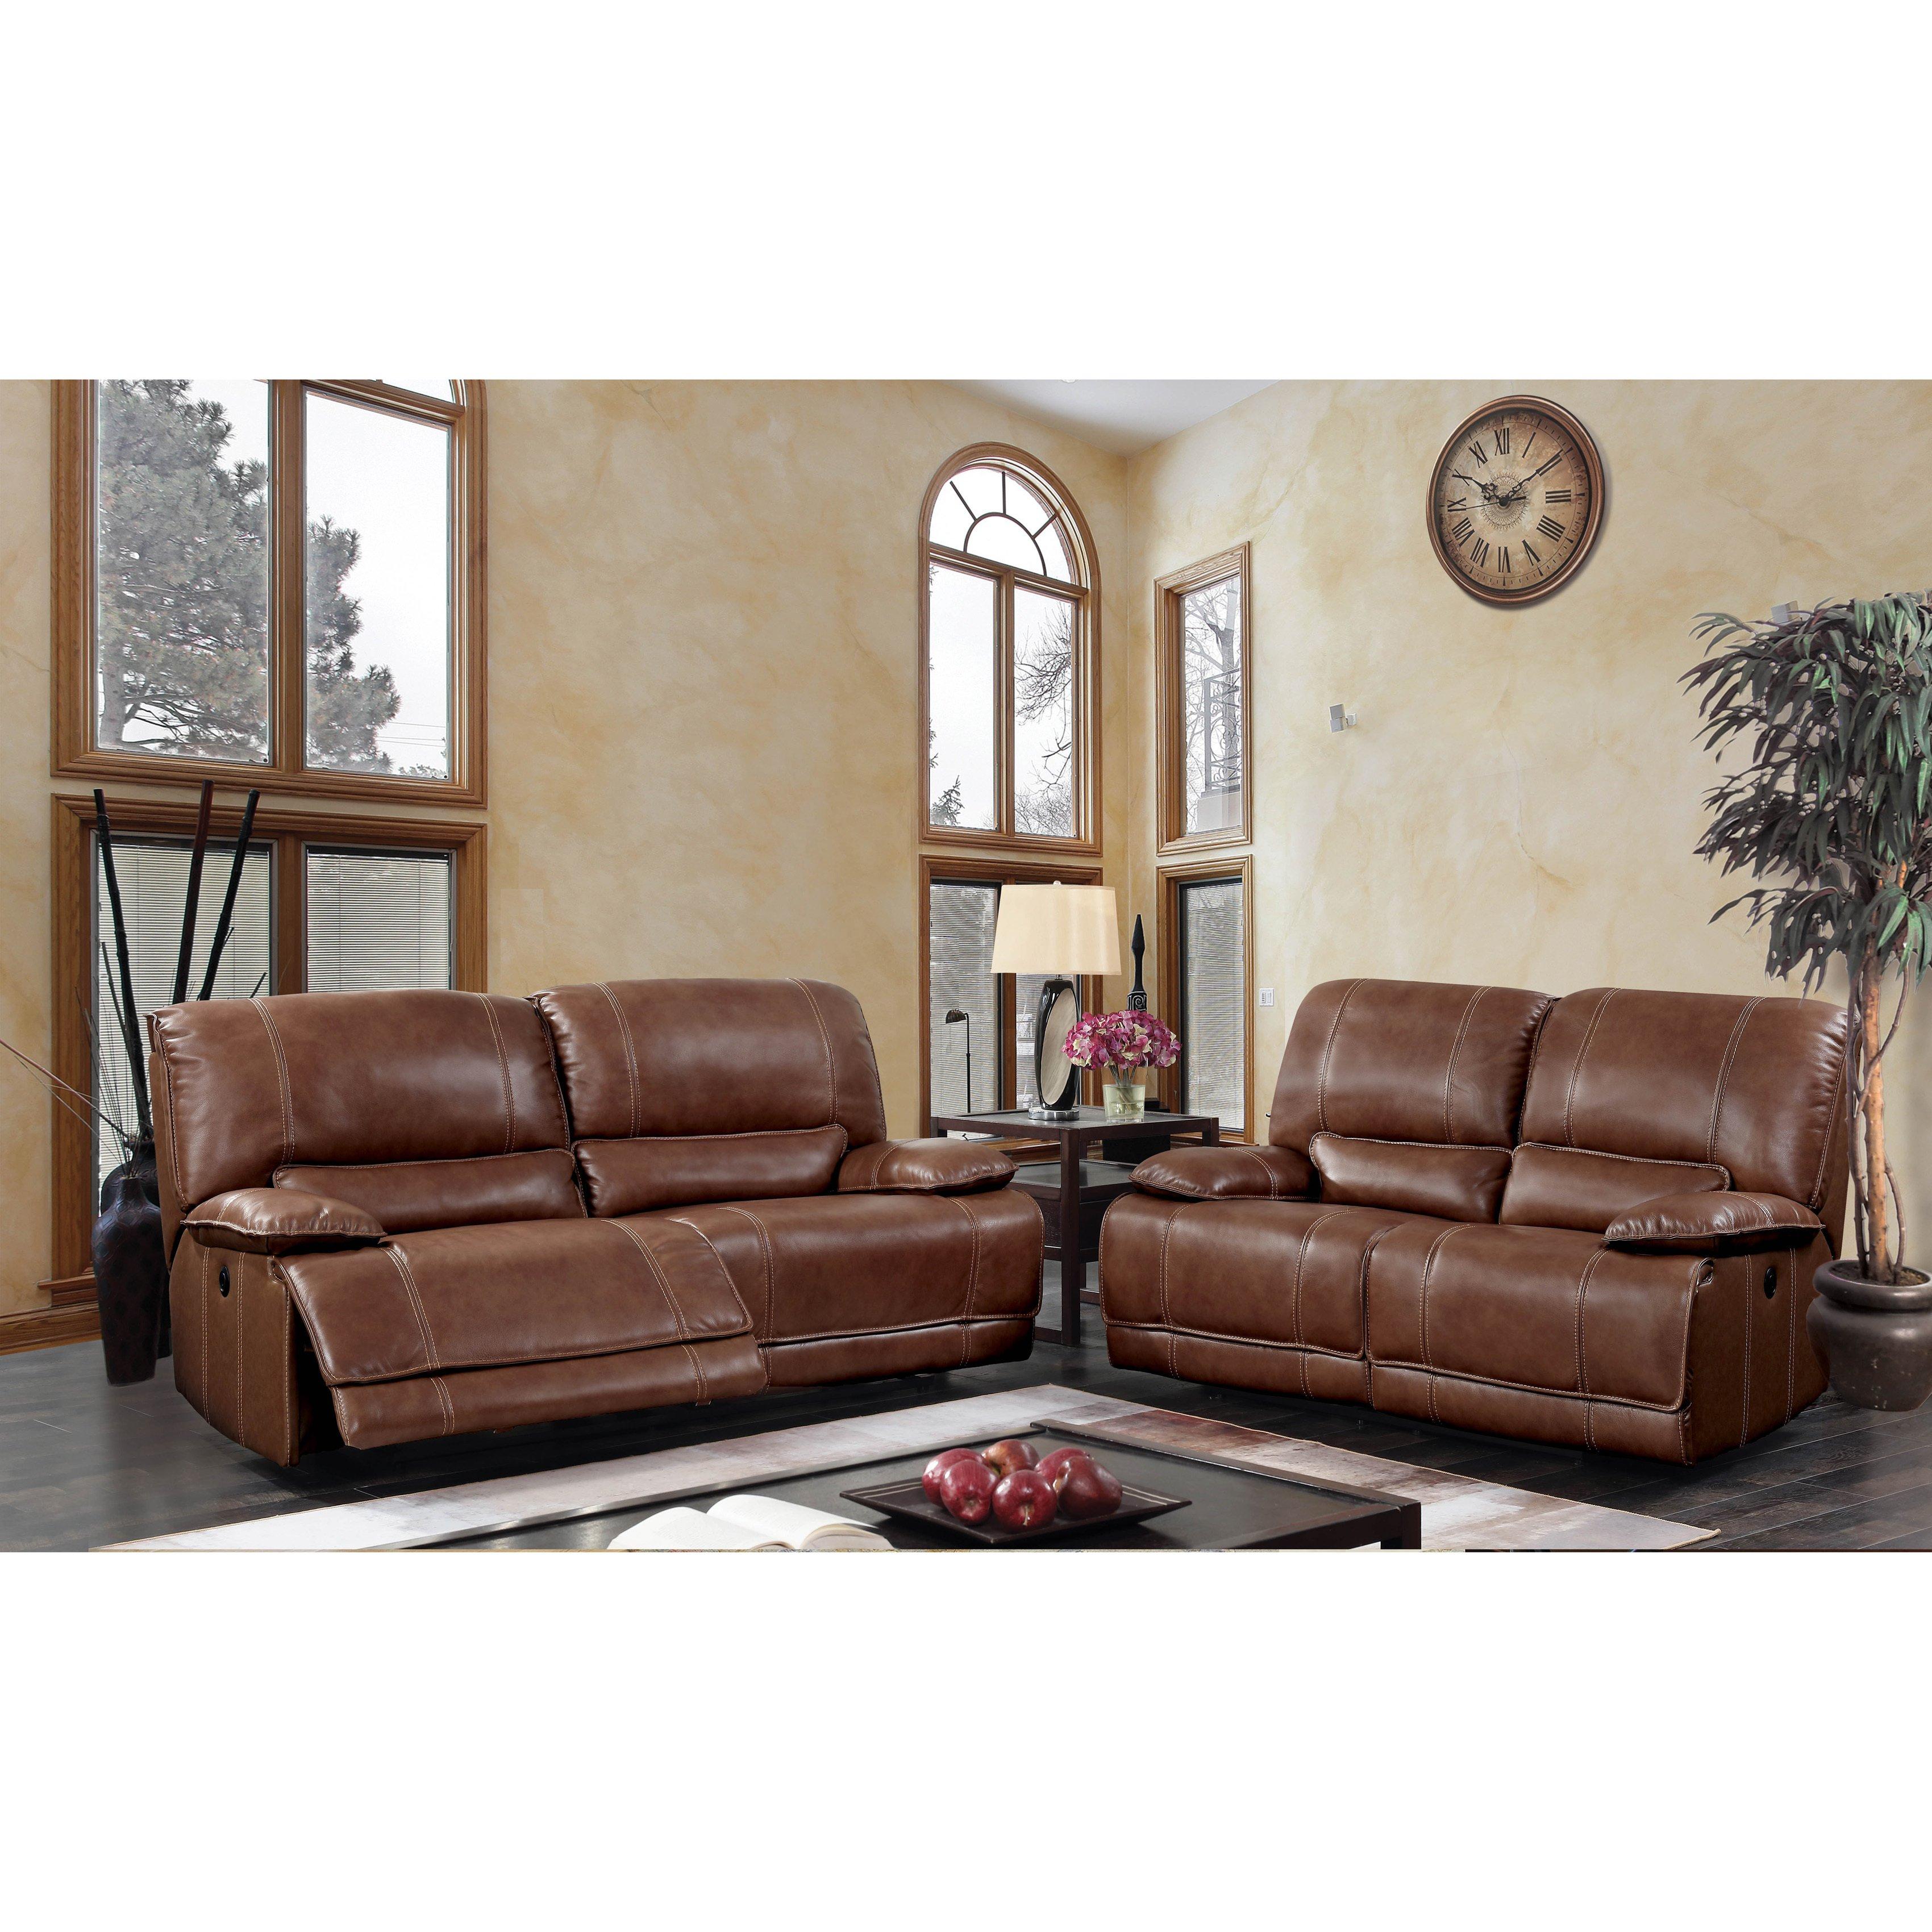 Furniture Of America Sierra Brown Usb Power Assist Loveseat – Free Within Sierra Foam Ii Oversized Sofa Chairs (View 22 of 25)